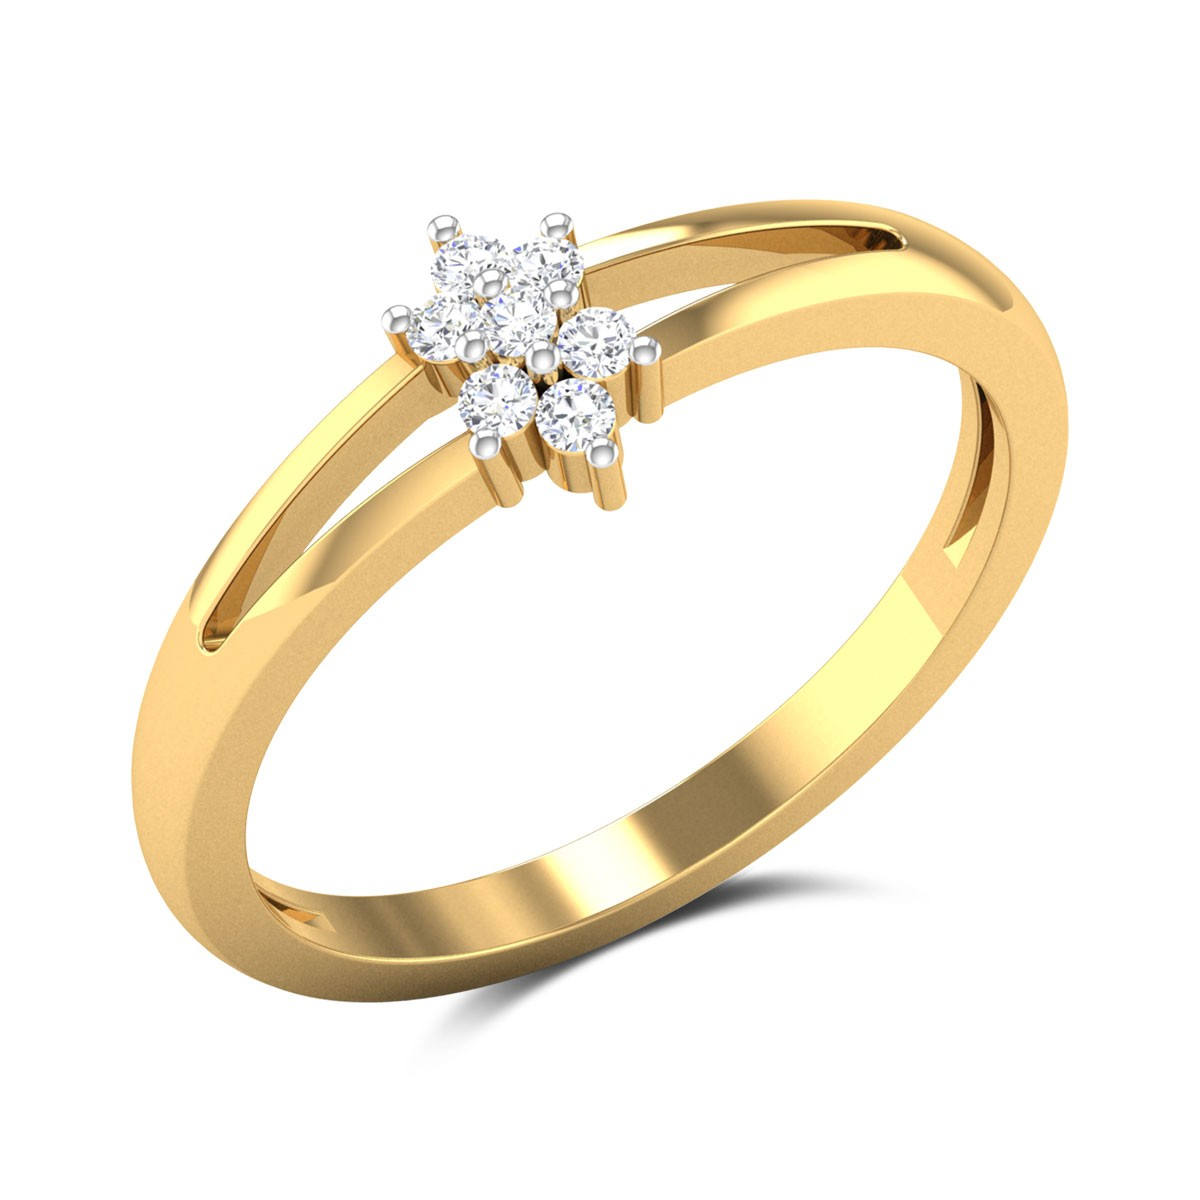 Heidi Diamond Ring